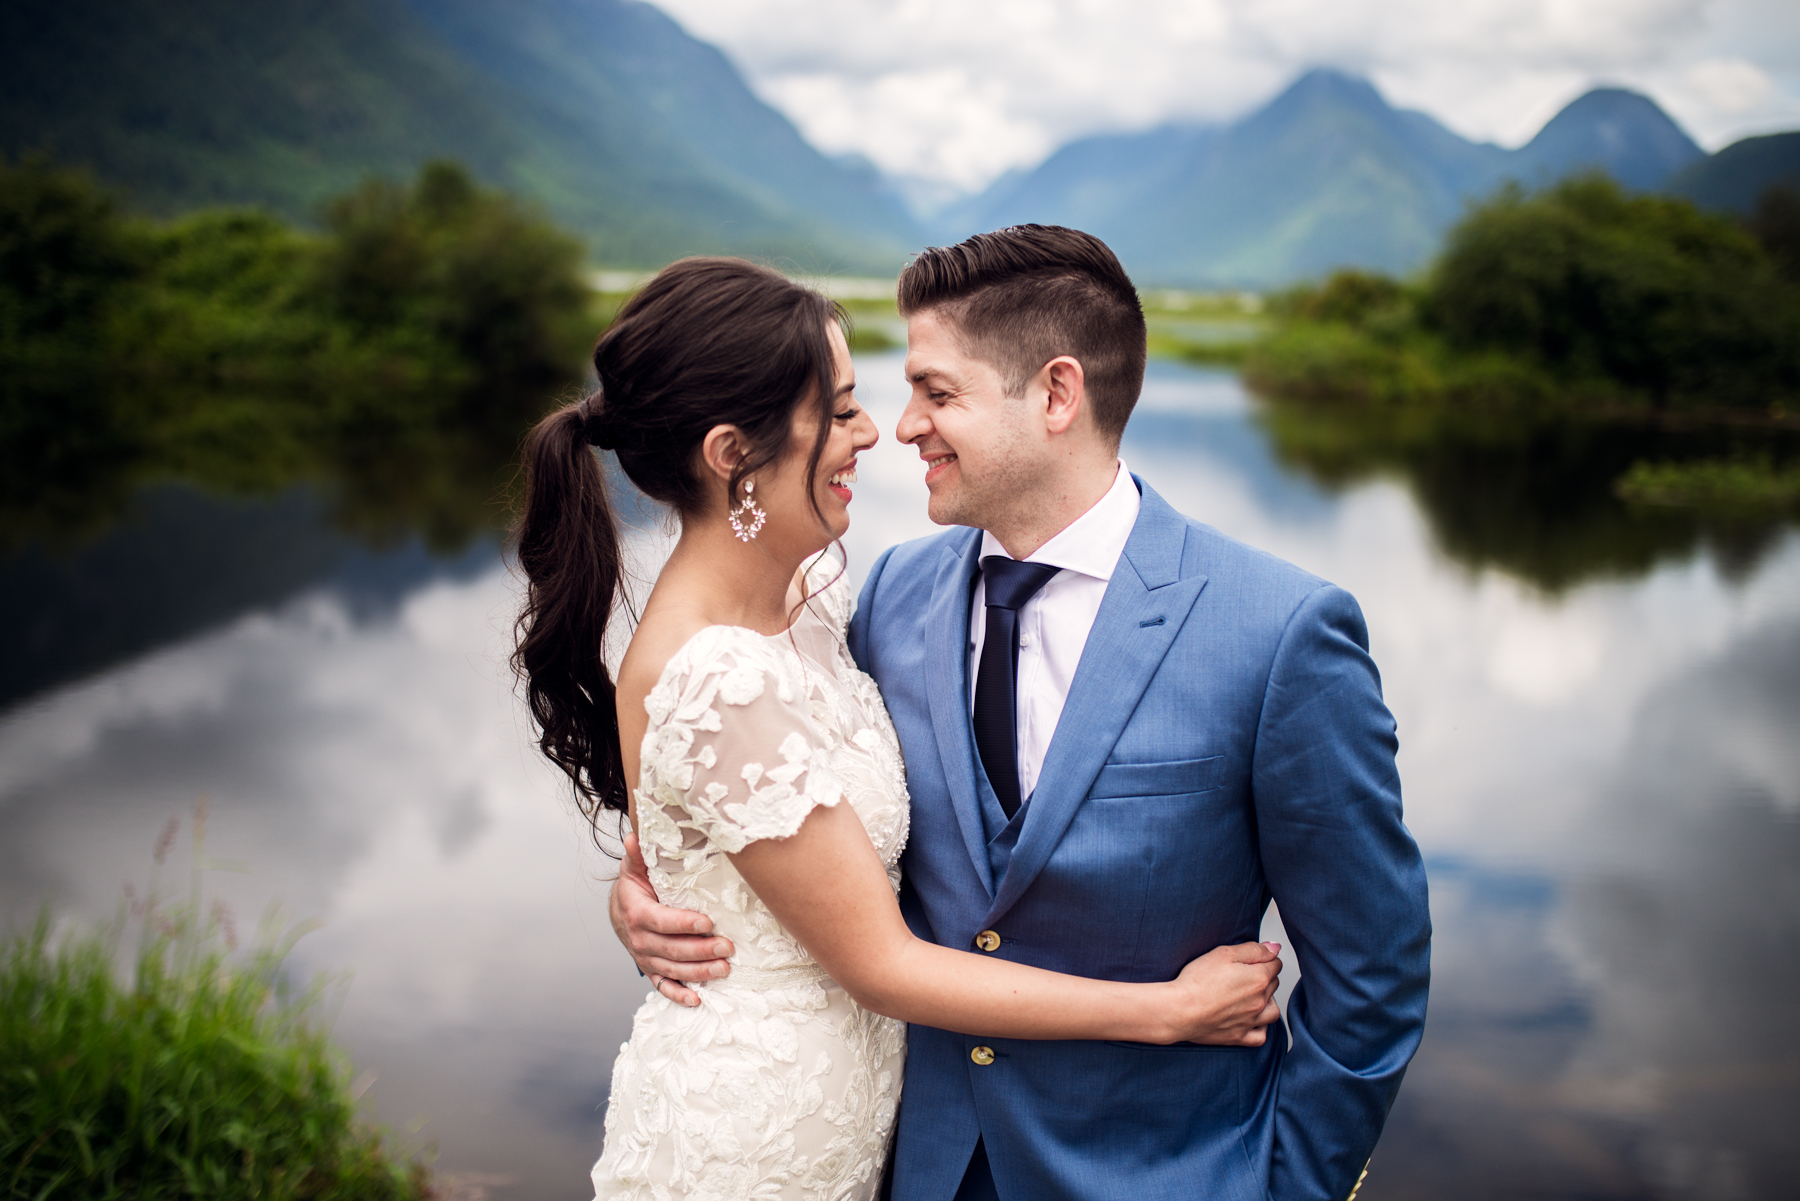 dp-wedding-web-019